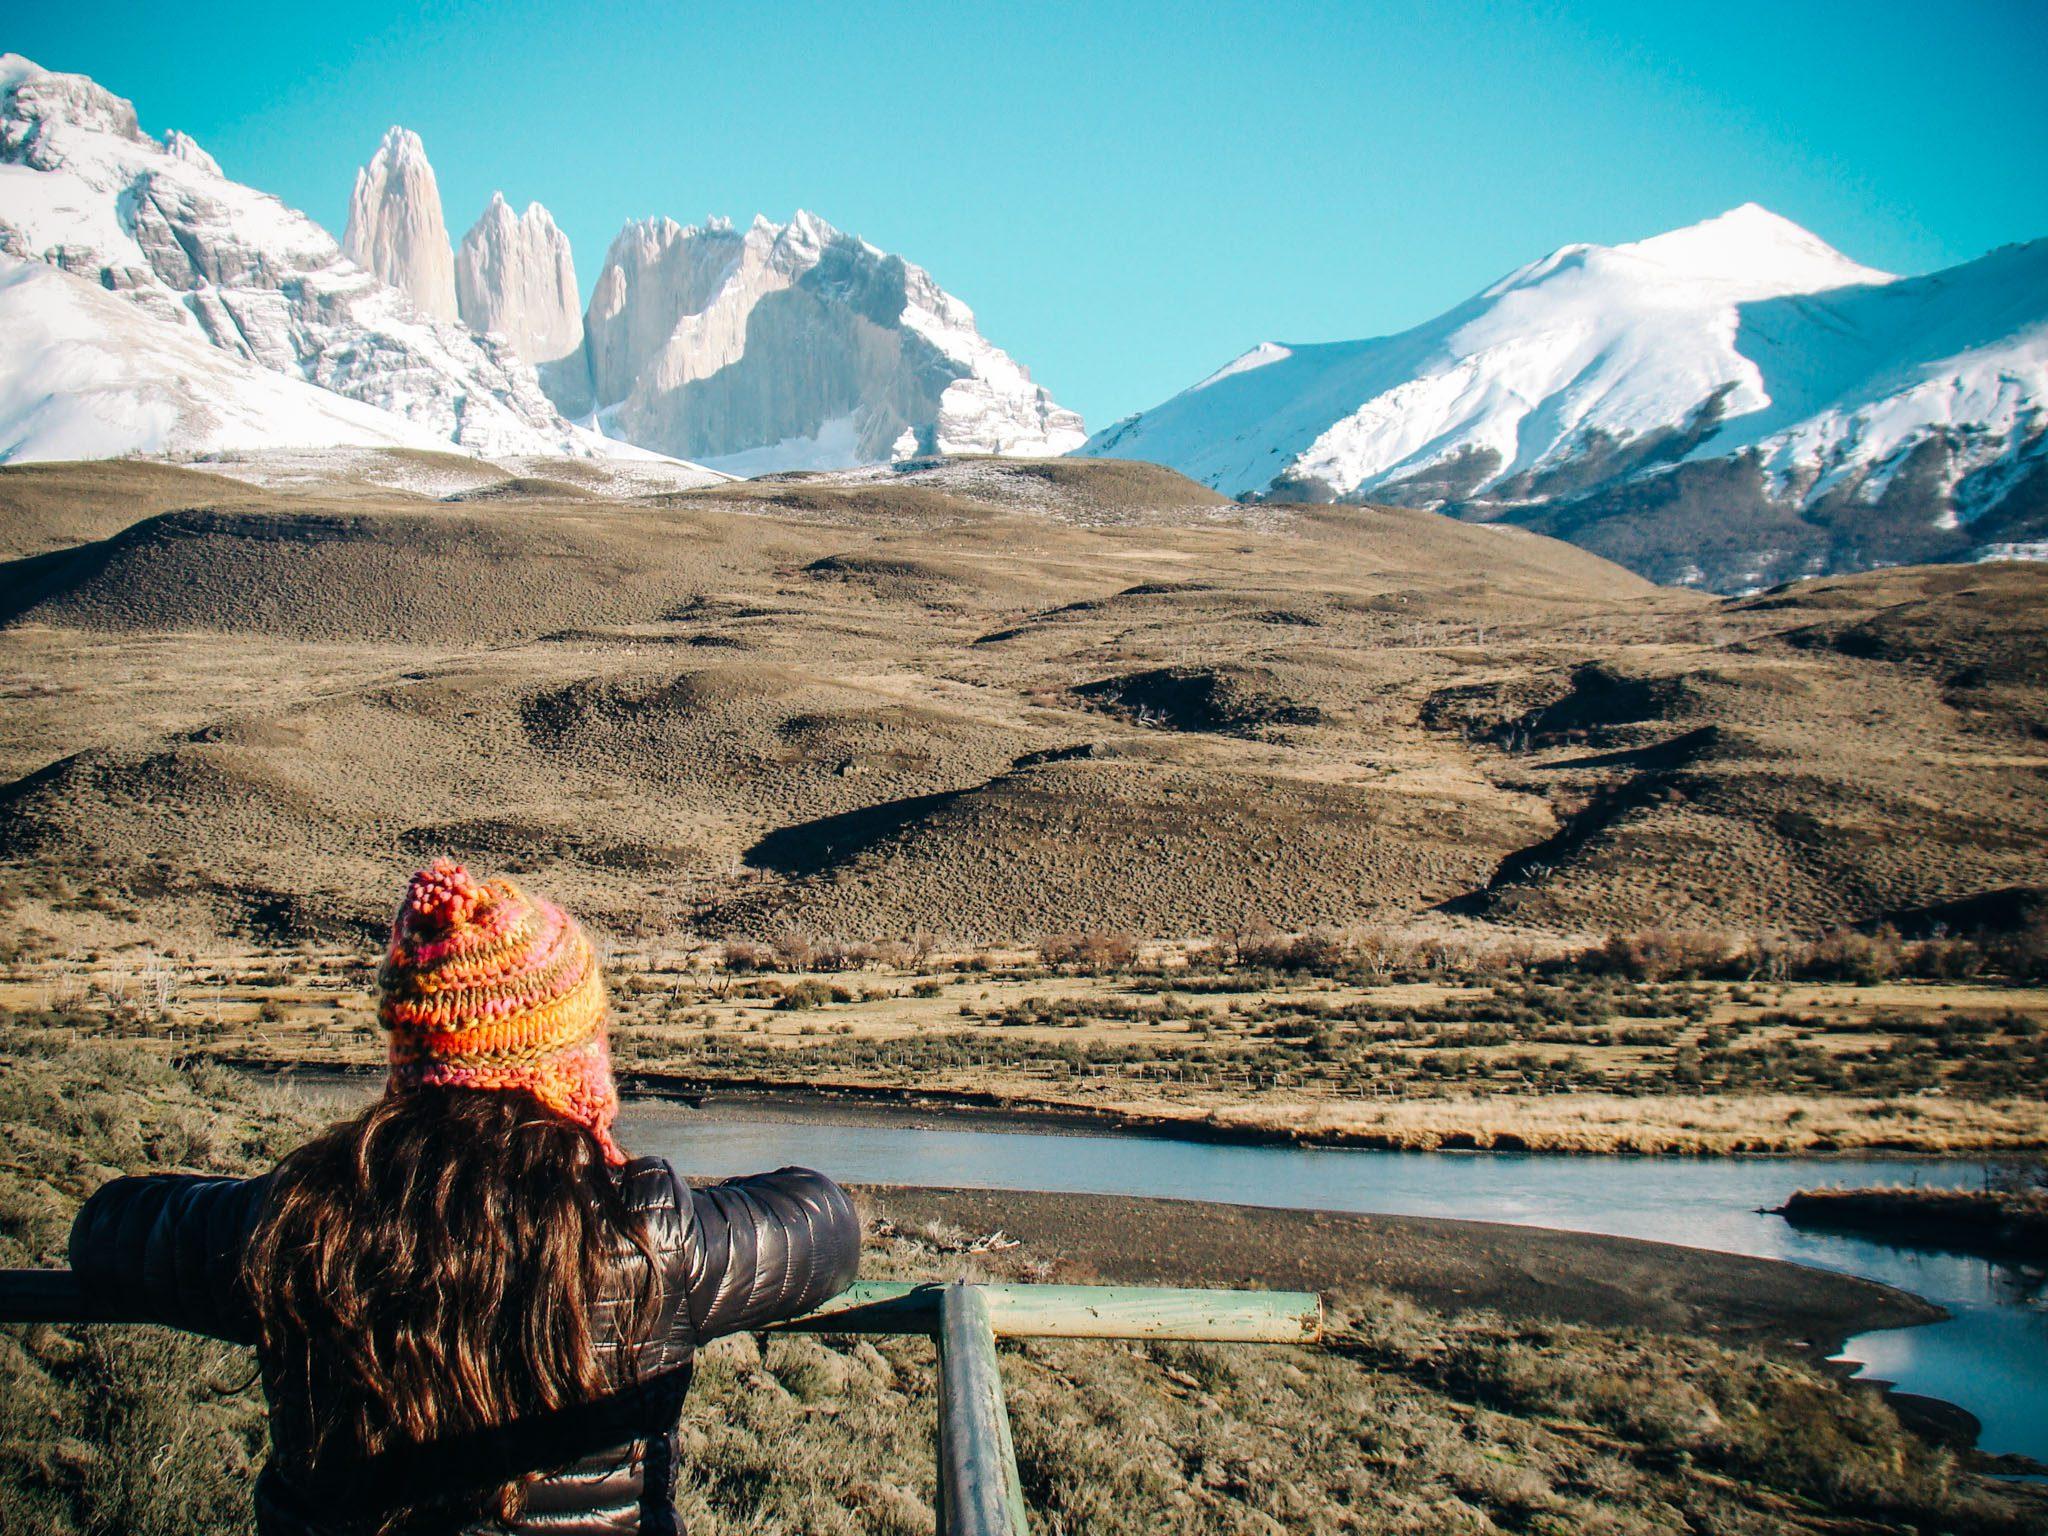 Gisele em Torres del Paine, Chile